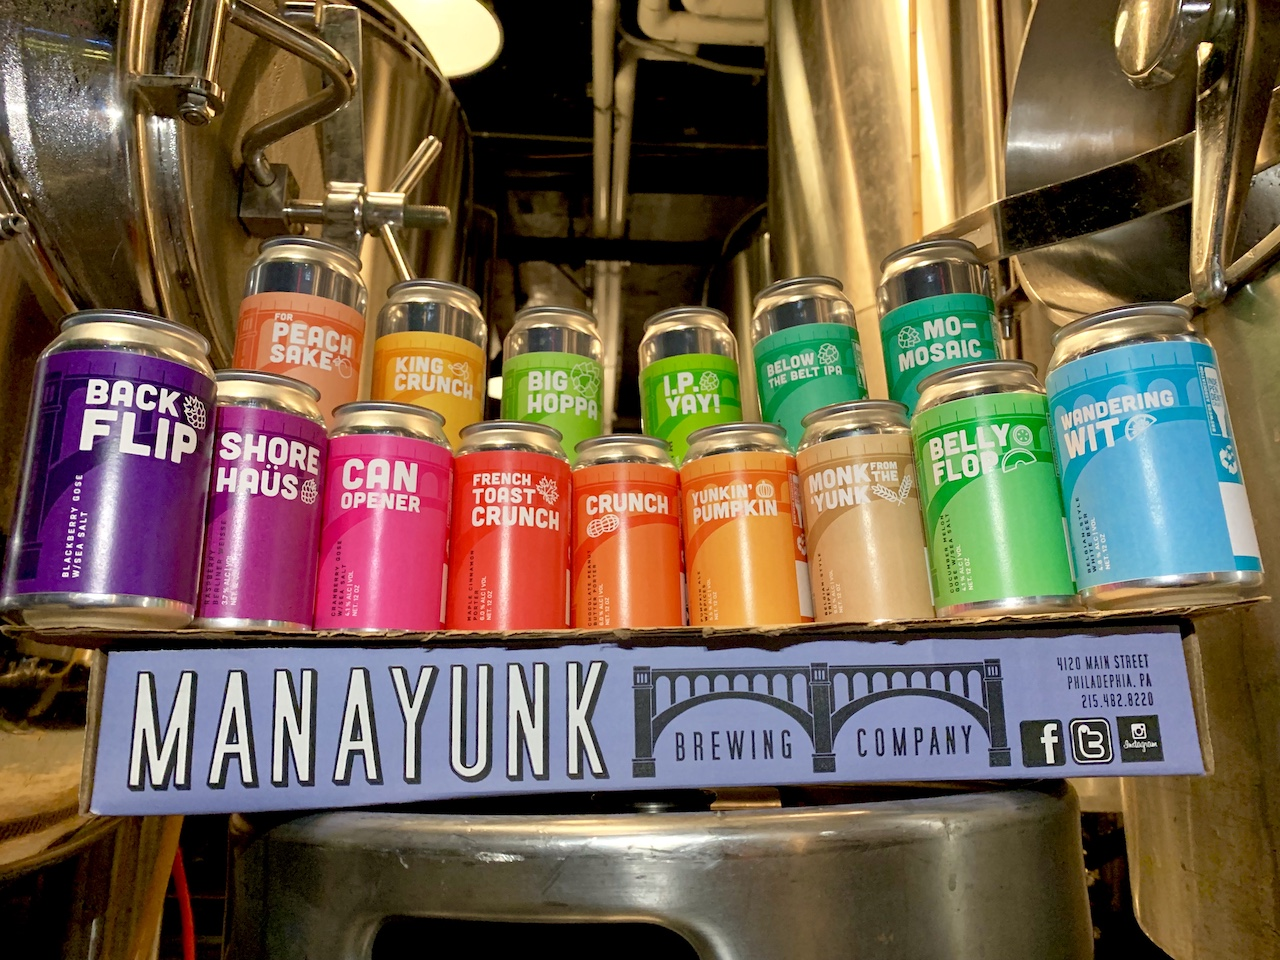 Manayunk Brewing 2019 Cans